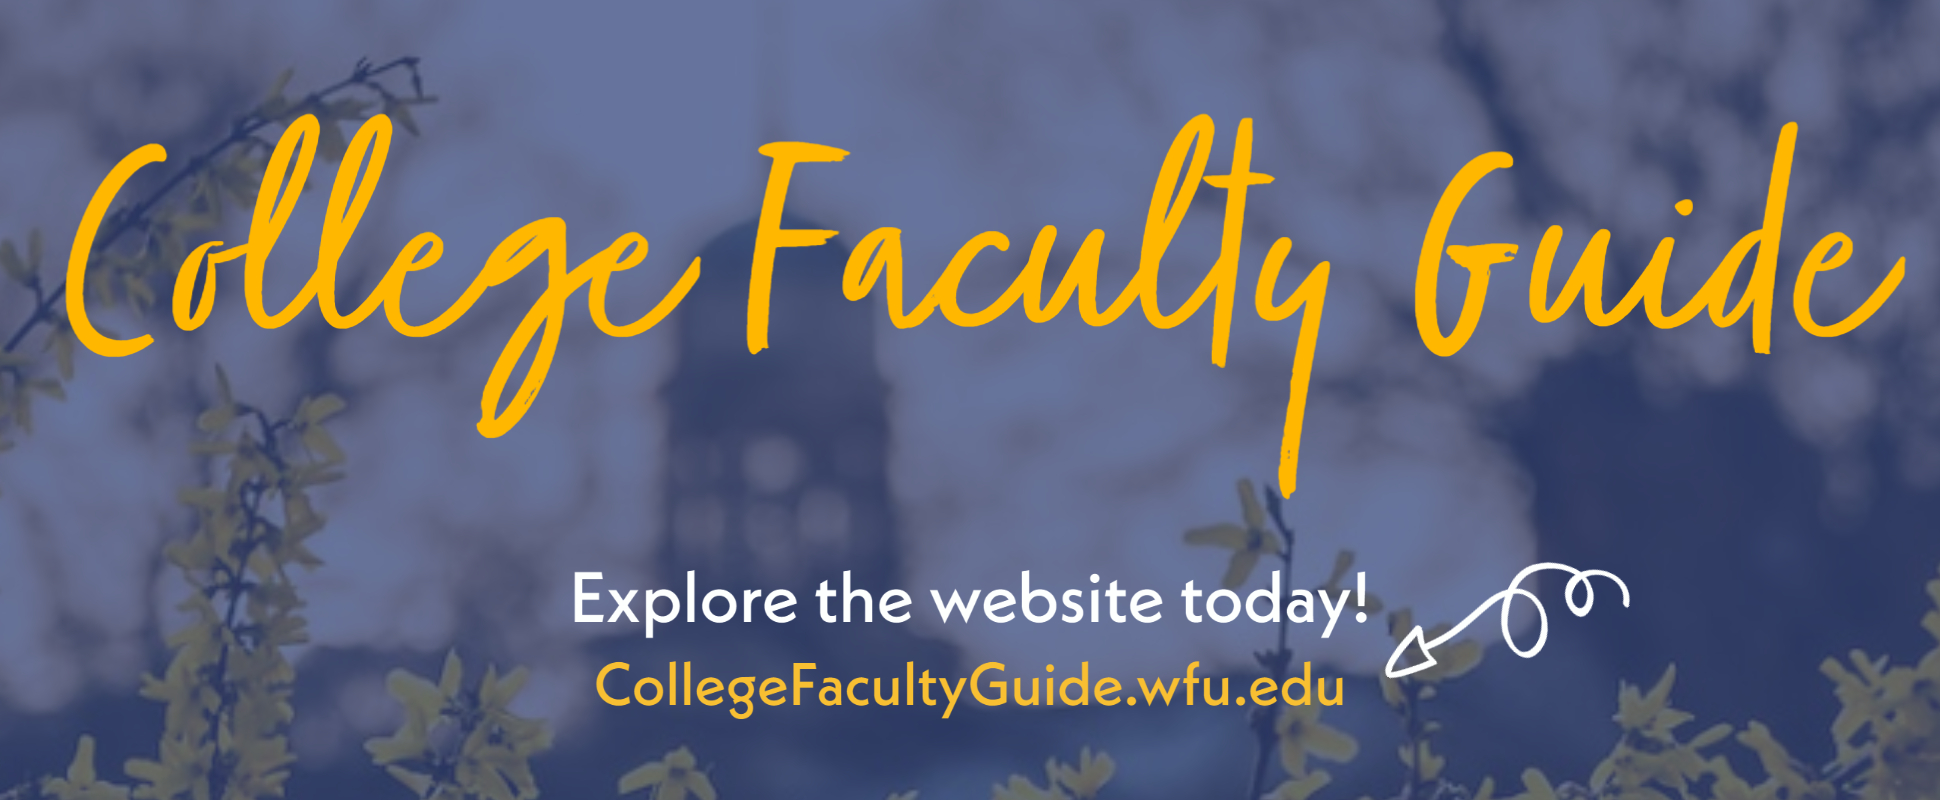 College Faculty Website link